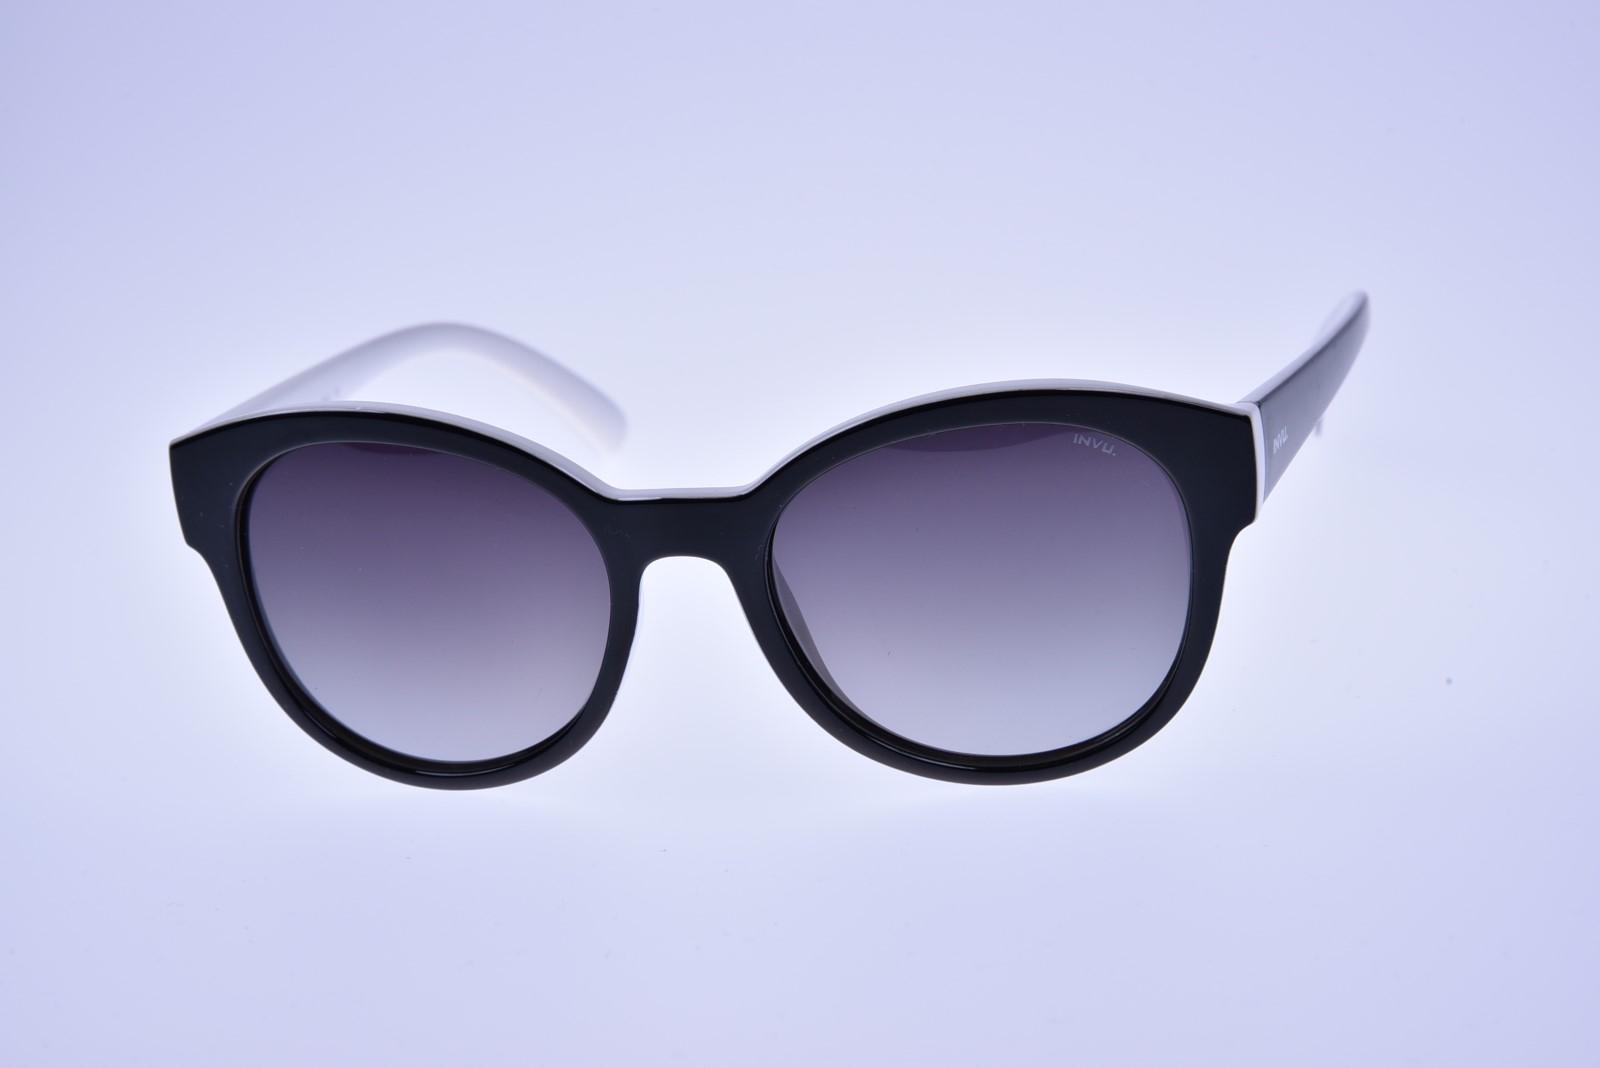 de8cab57d INVU. Trend T2601A - Dámske, pánske a detské slnečné okuliare ...